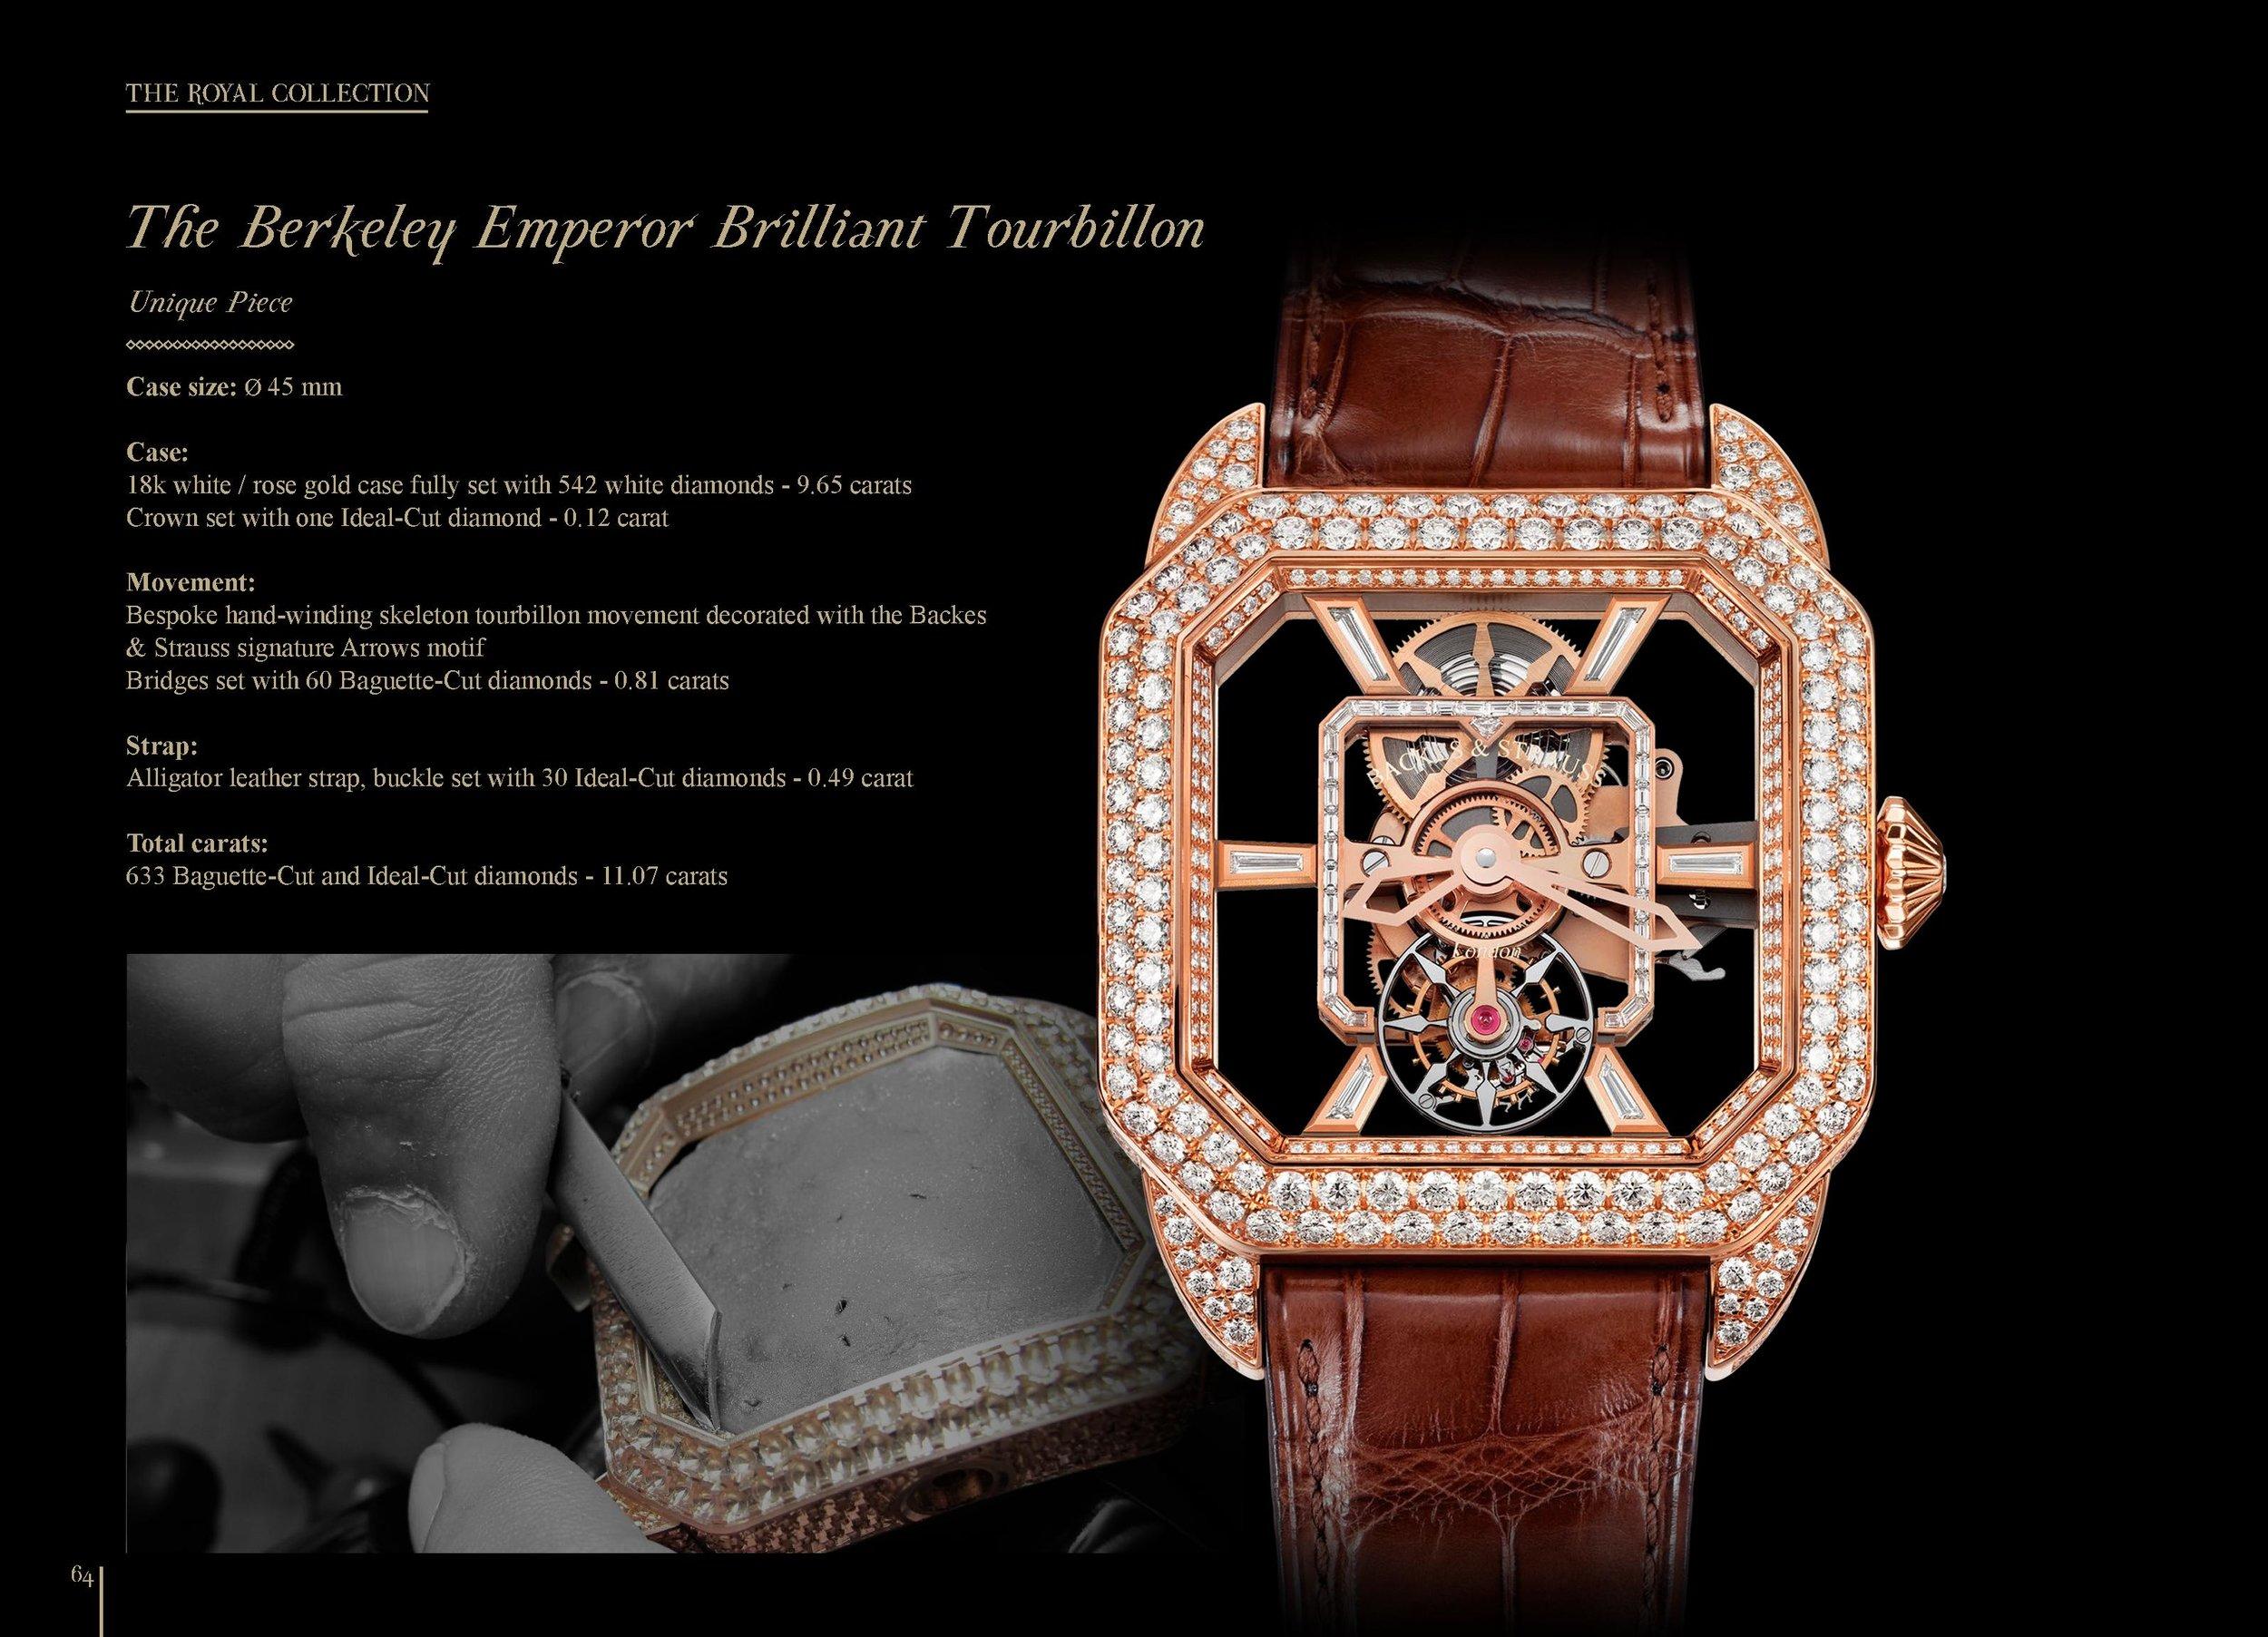 The Berkeley Emperor Brilliant Tourbillon 45 watch